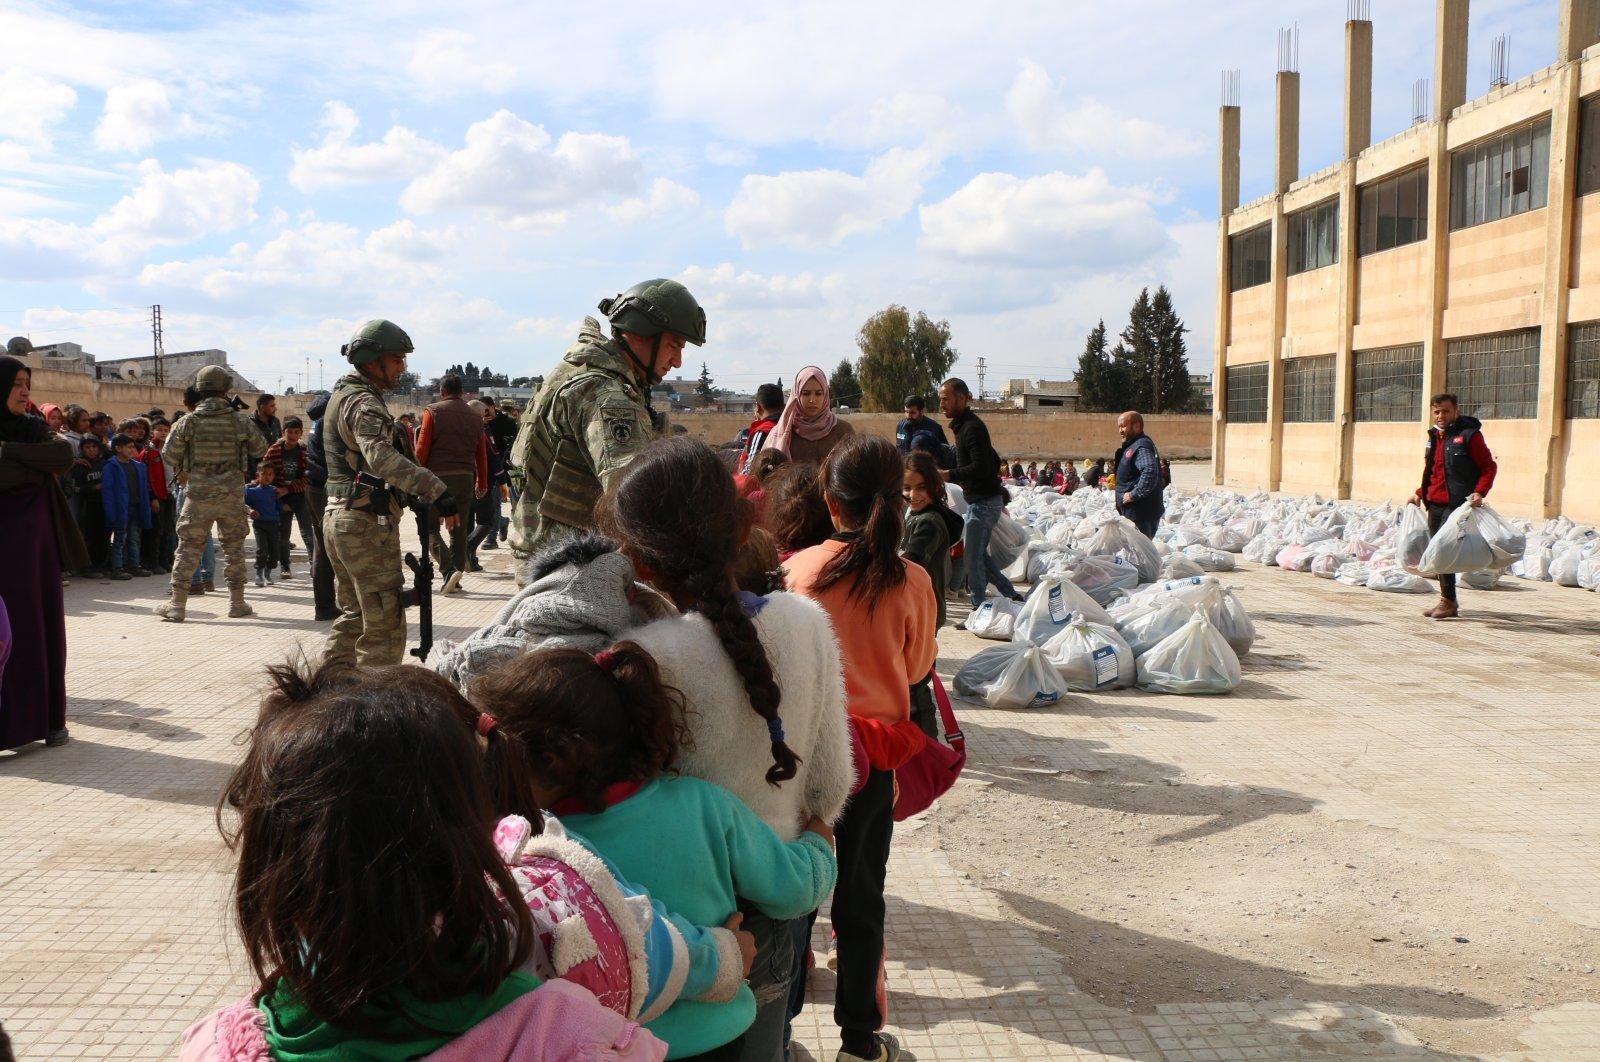 Turkish troops distribute humanitarian aid to children in Ras-al Ain, Feb. 23, 2021. (AA Photo)